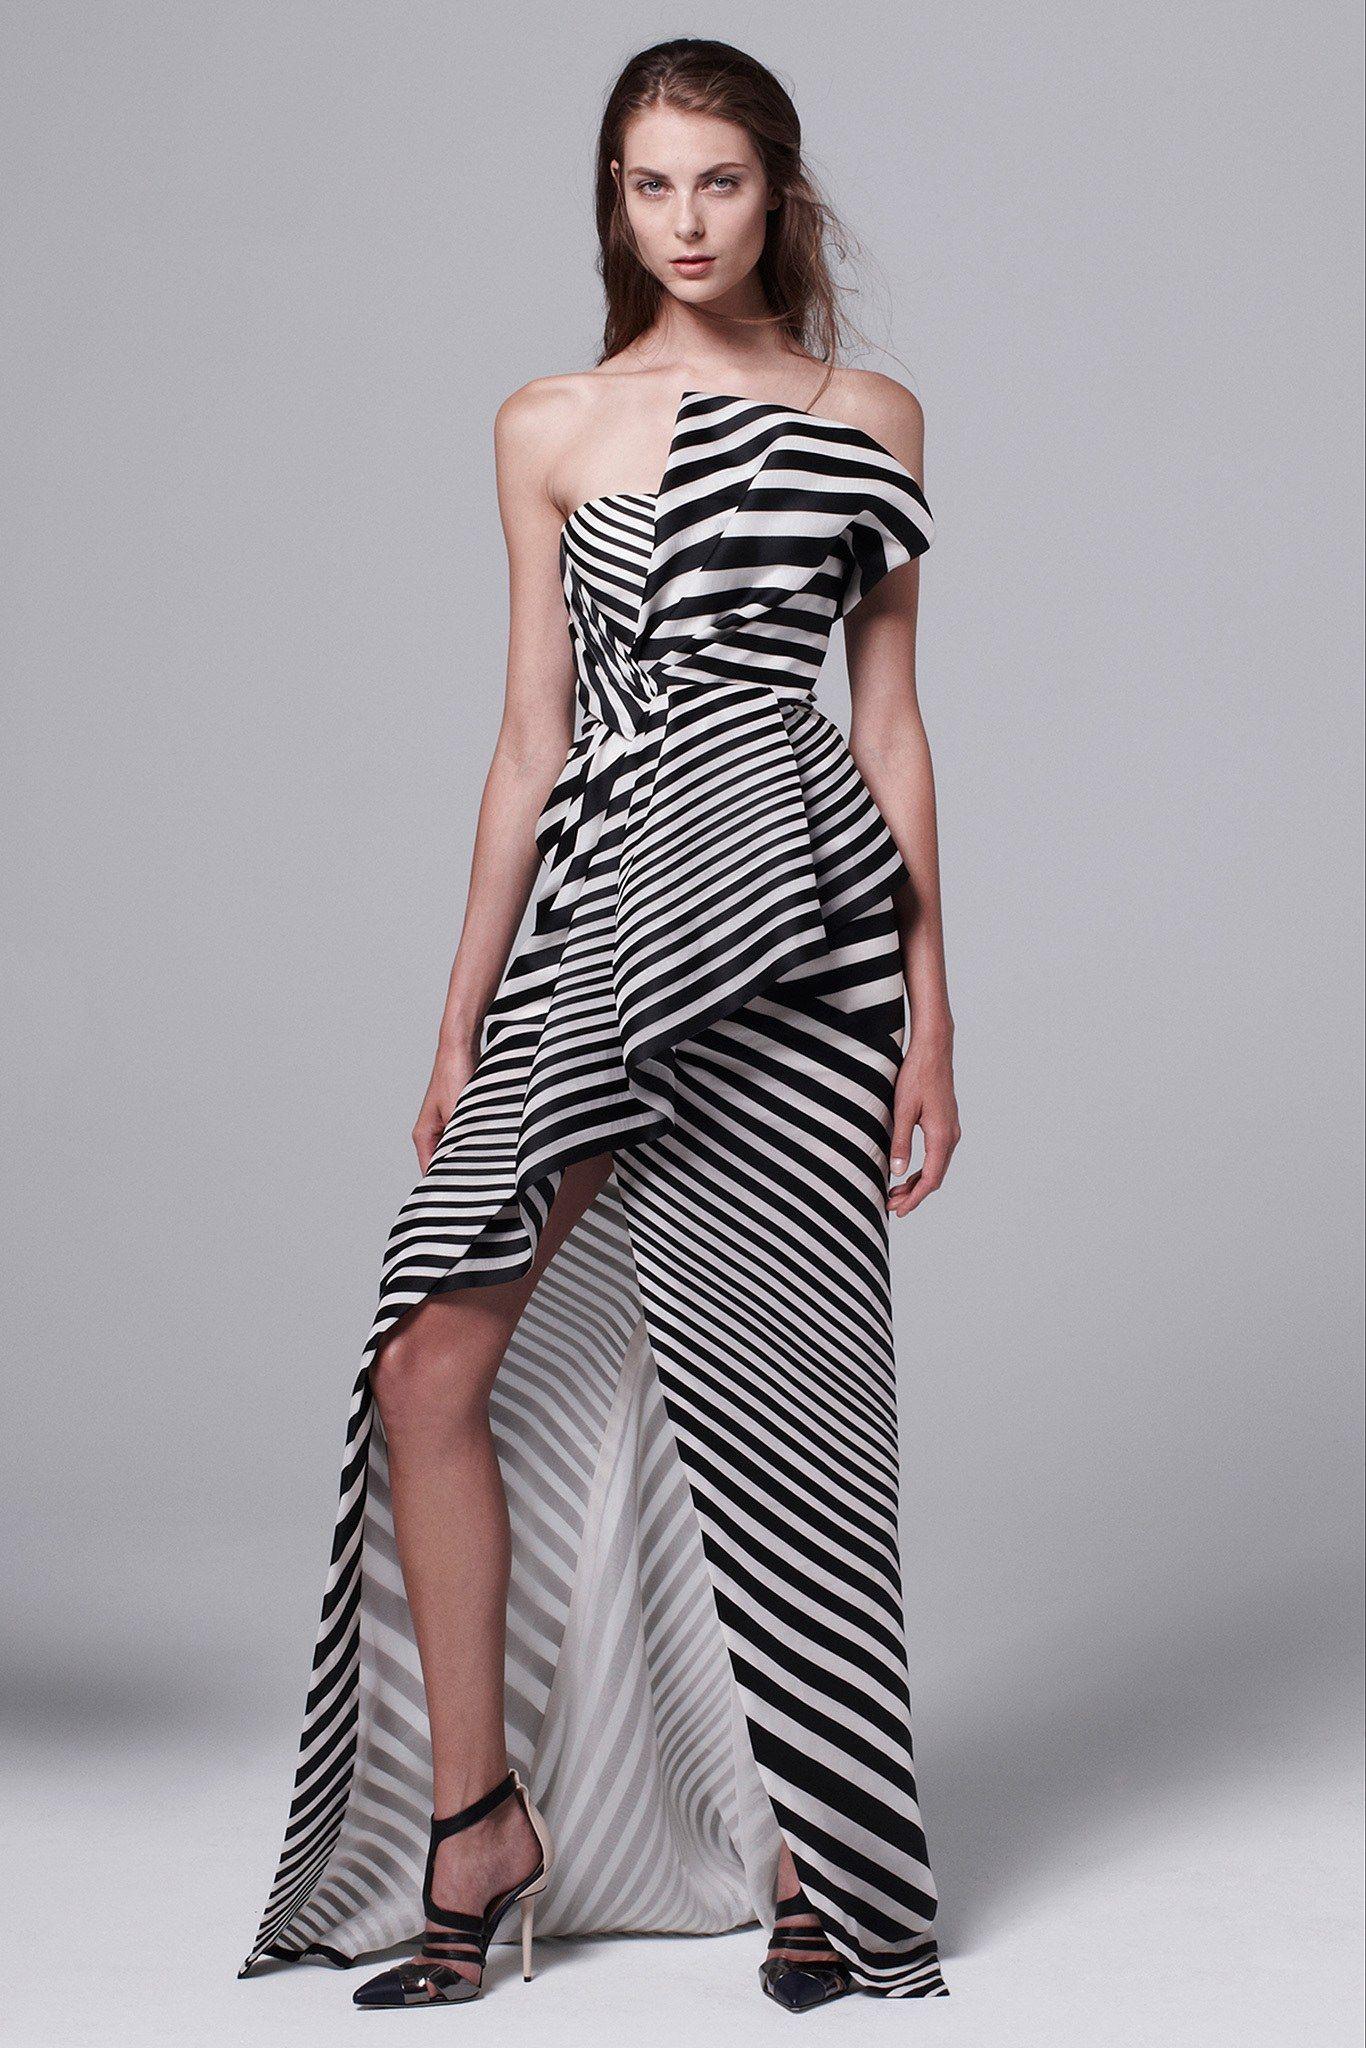 J. Mendel Resort 2014 Fashion Show